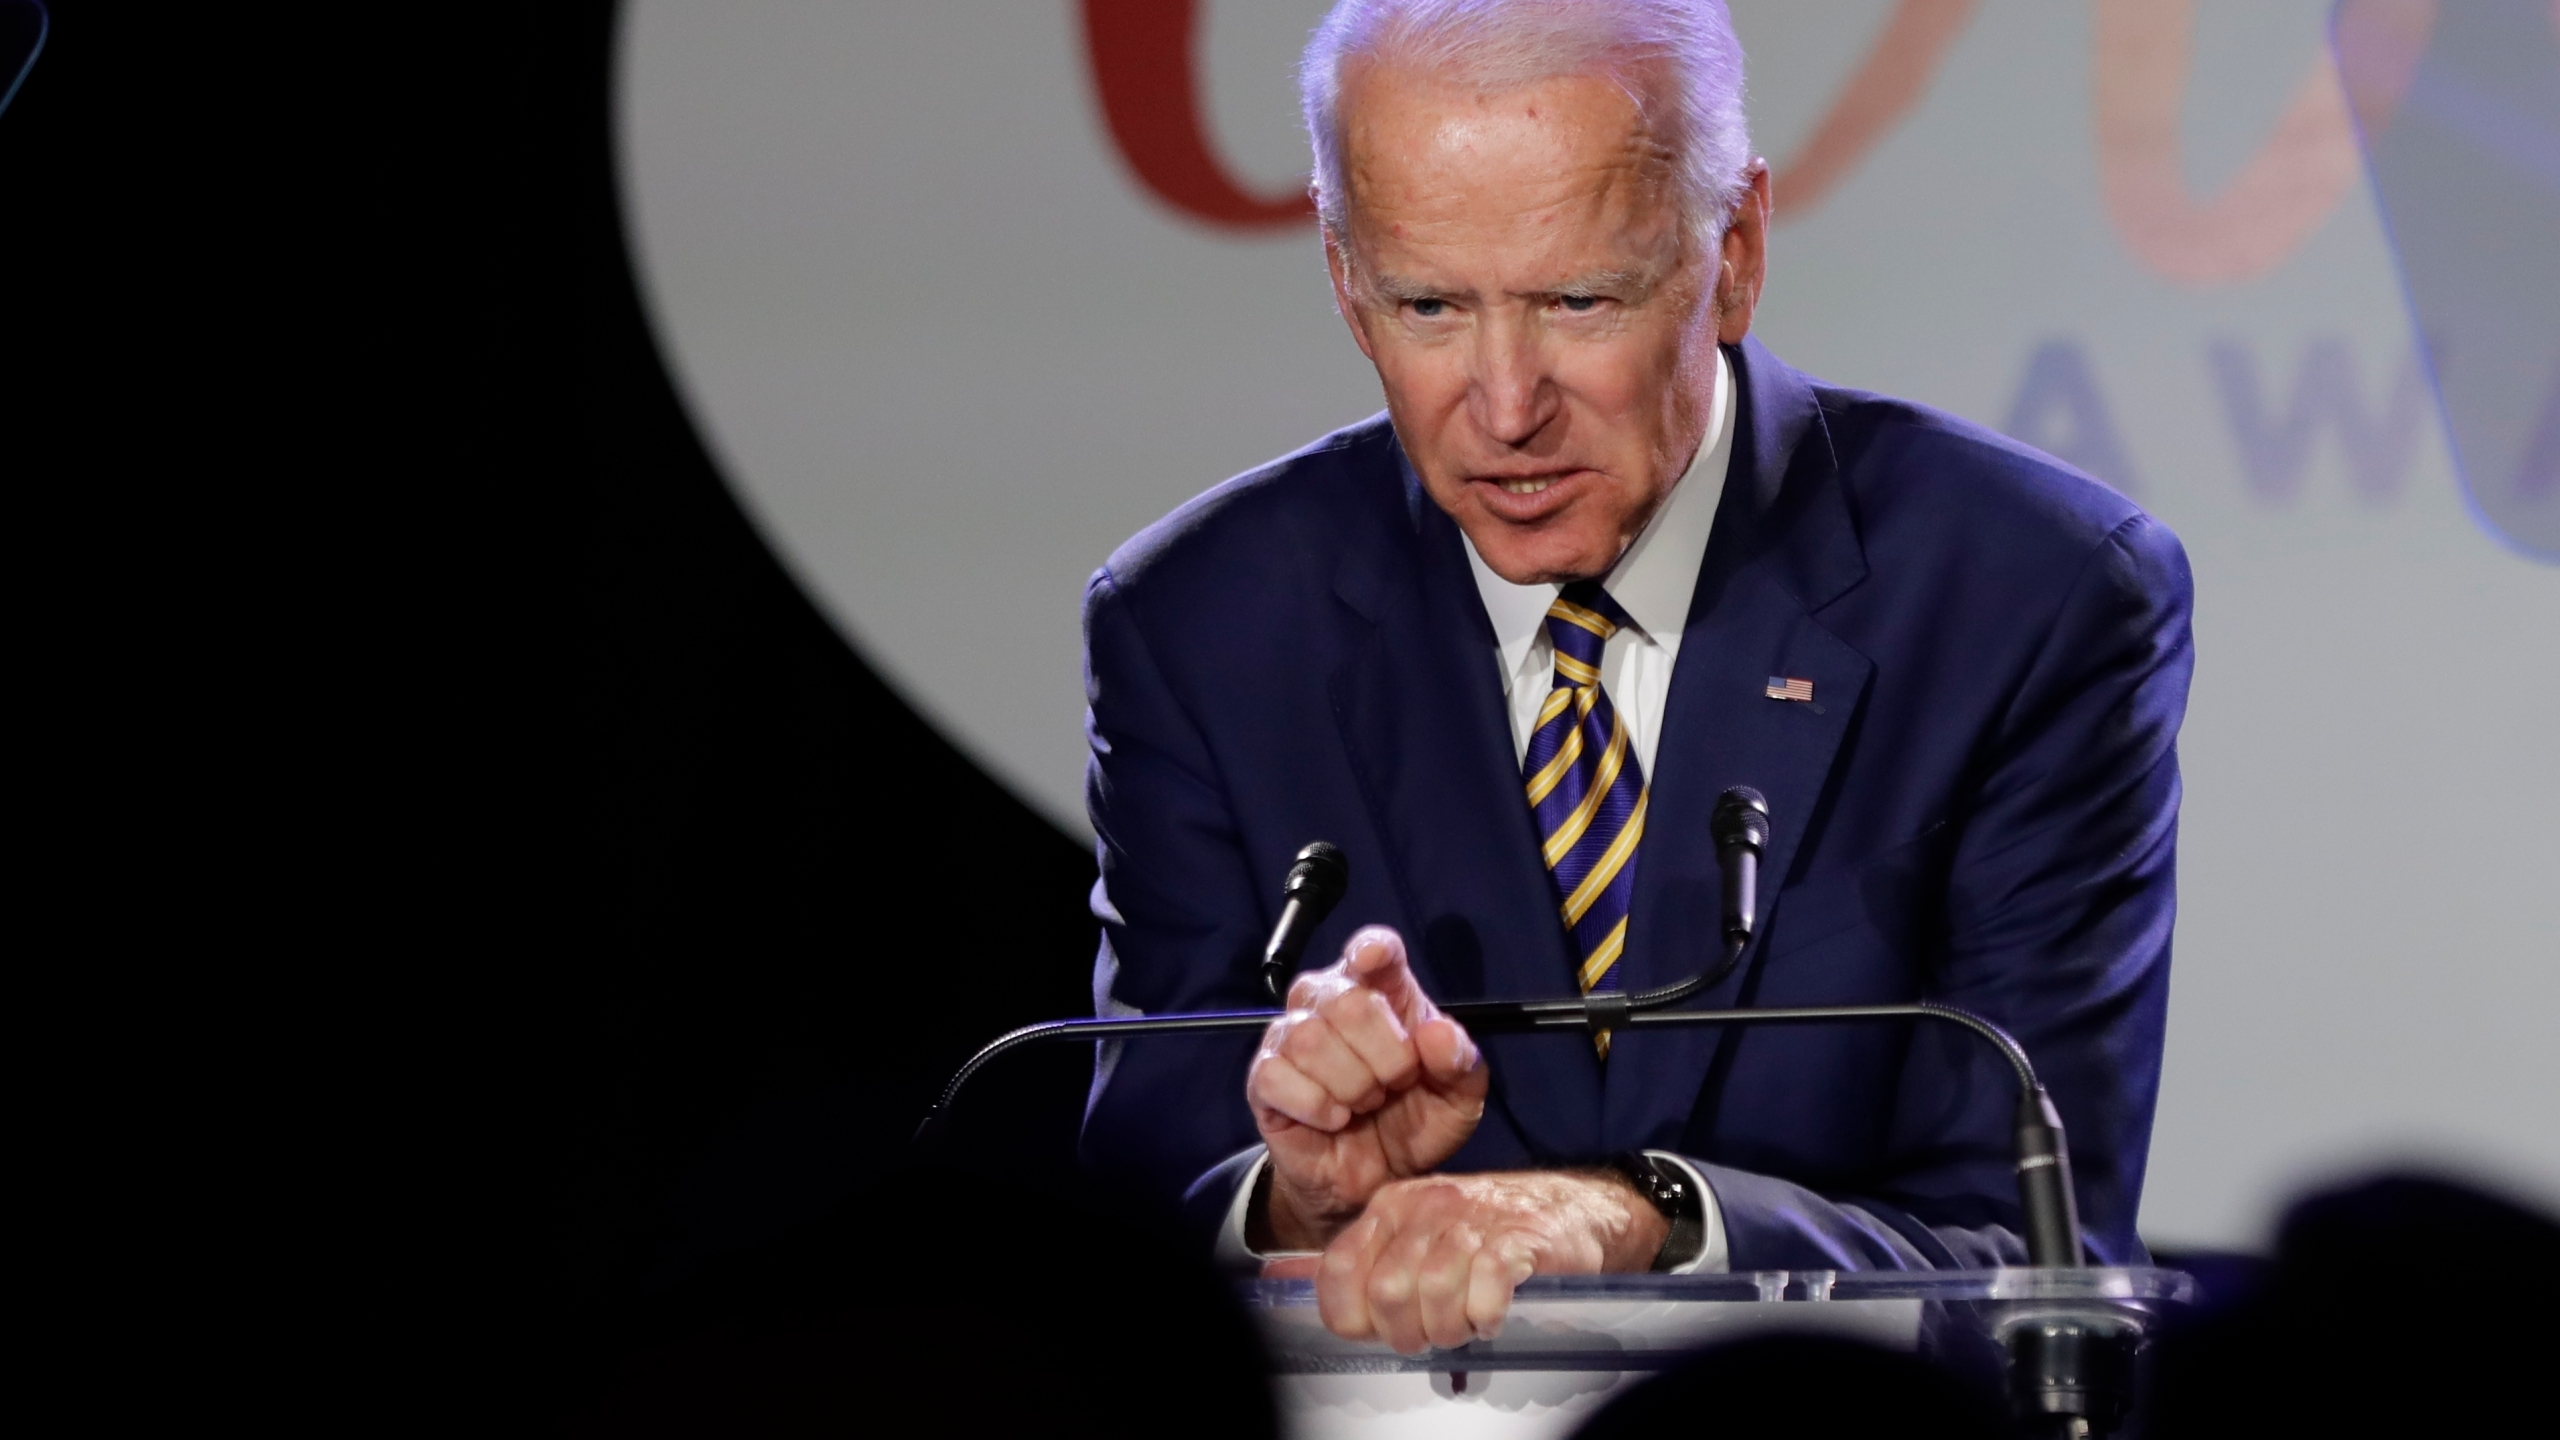 Election_2020_Joe_Biden_53157-159532.jpg28149933